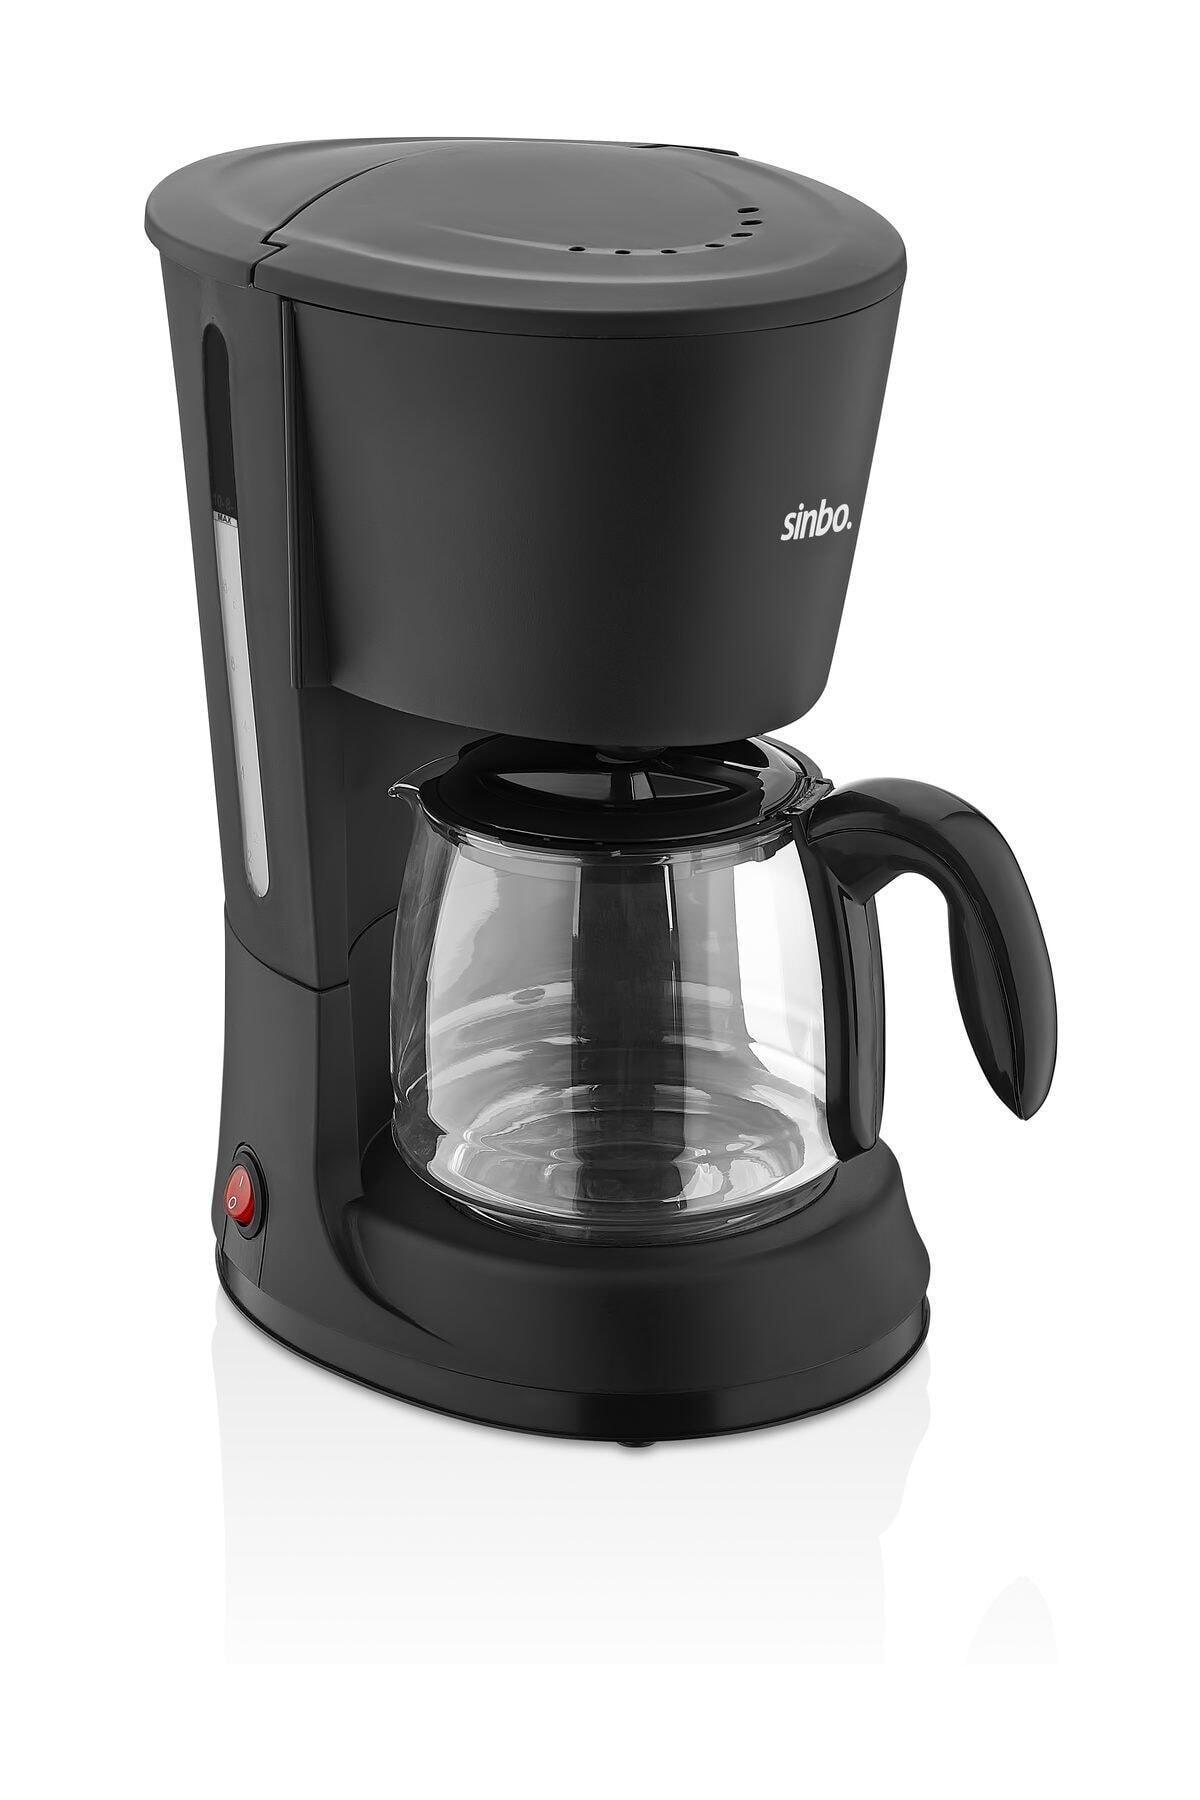 Sinbo Scm-2953 Filtre Kahve Makinesi 1